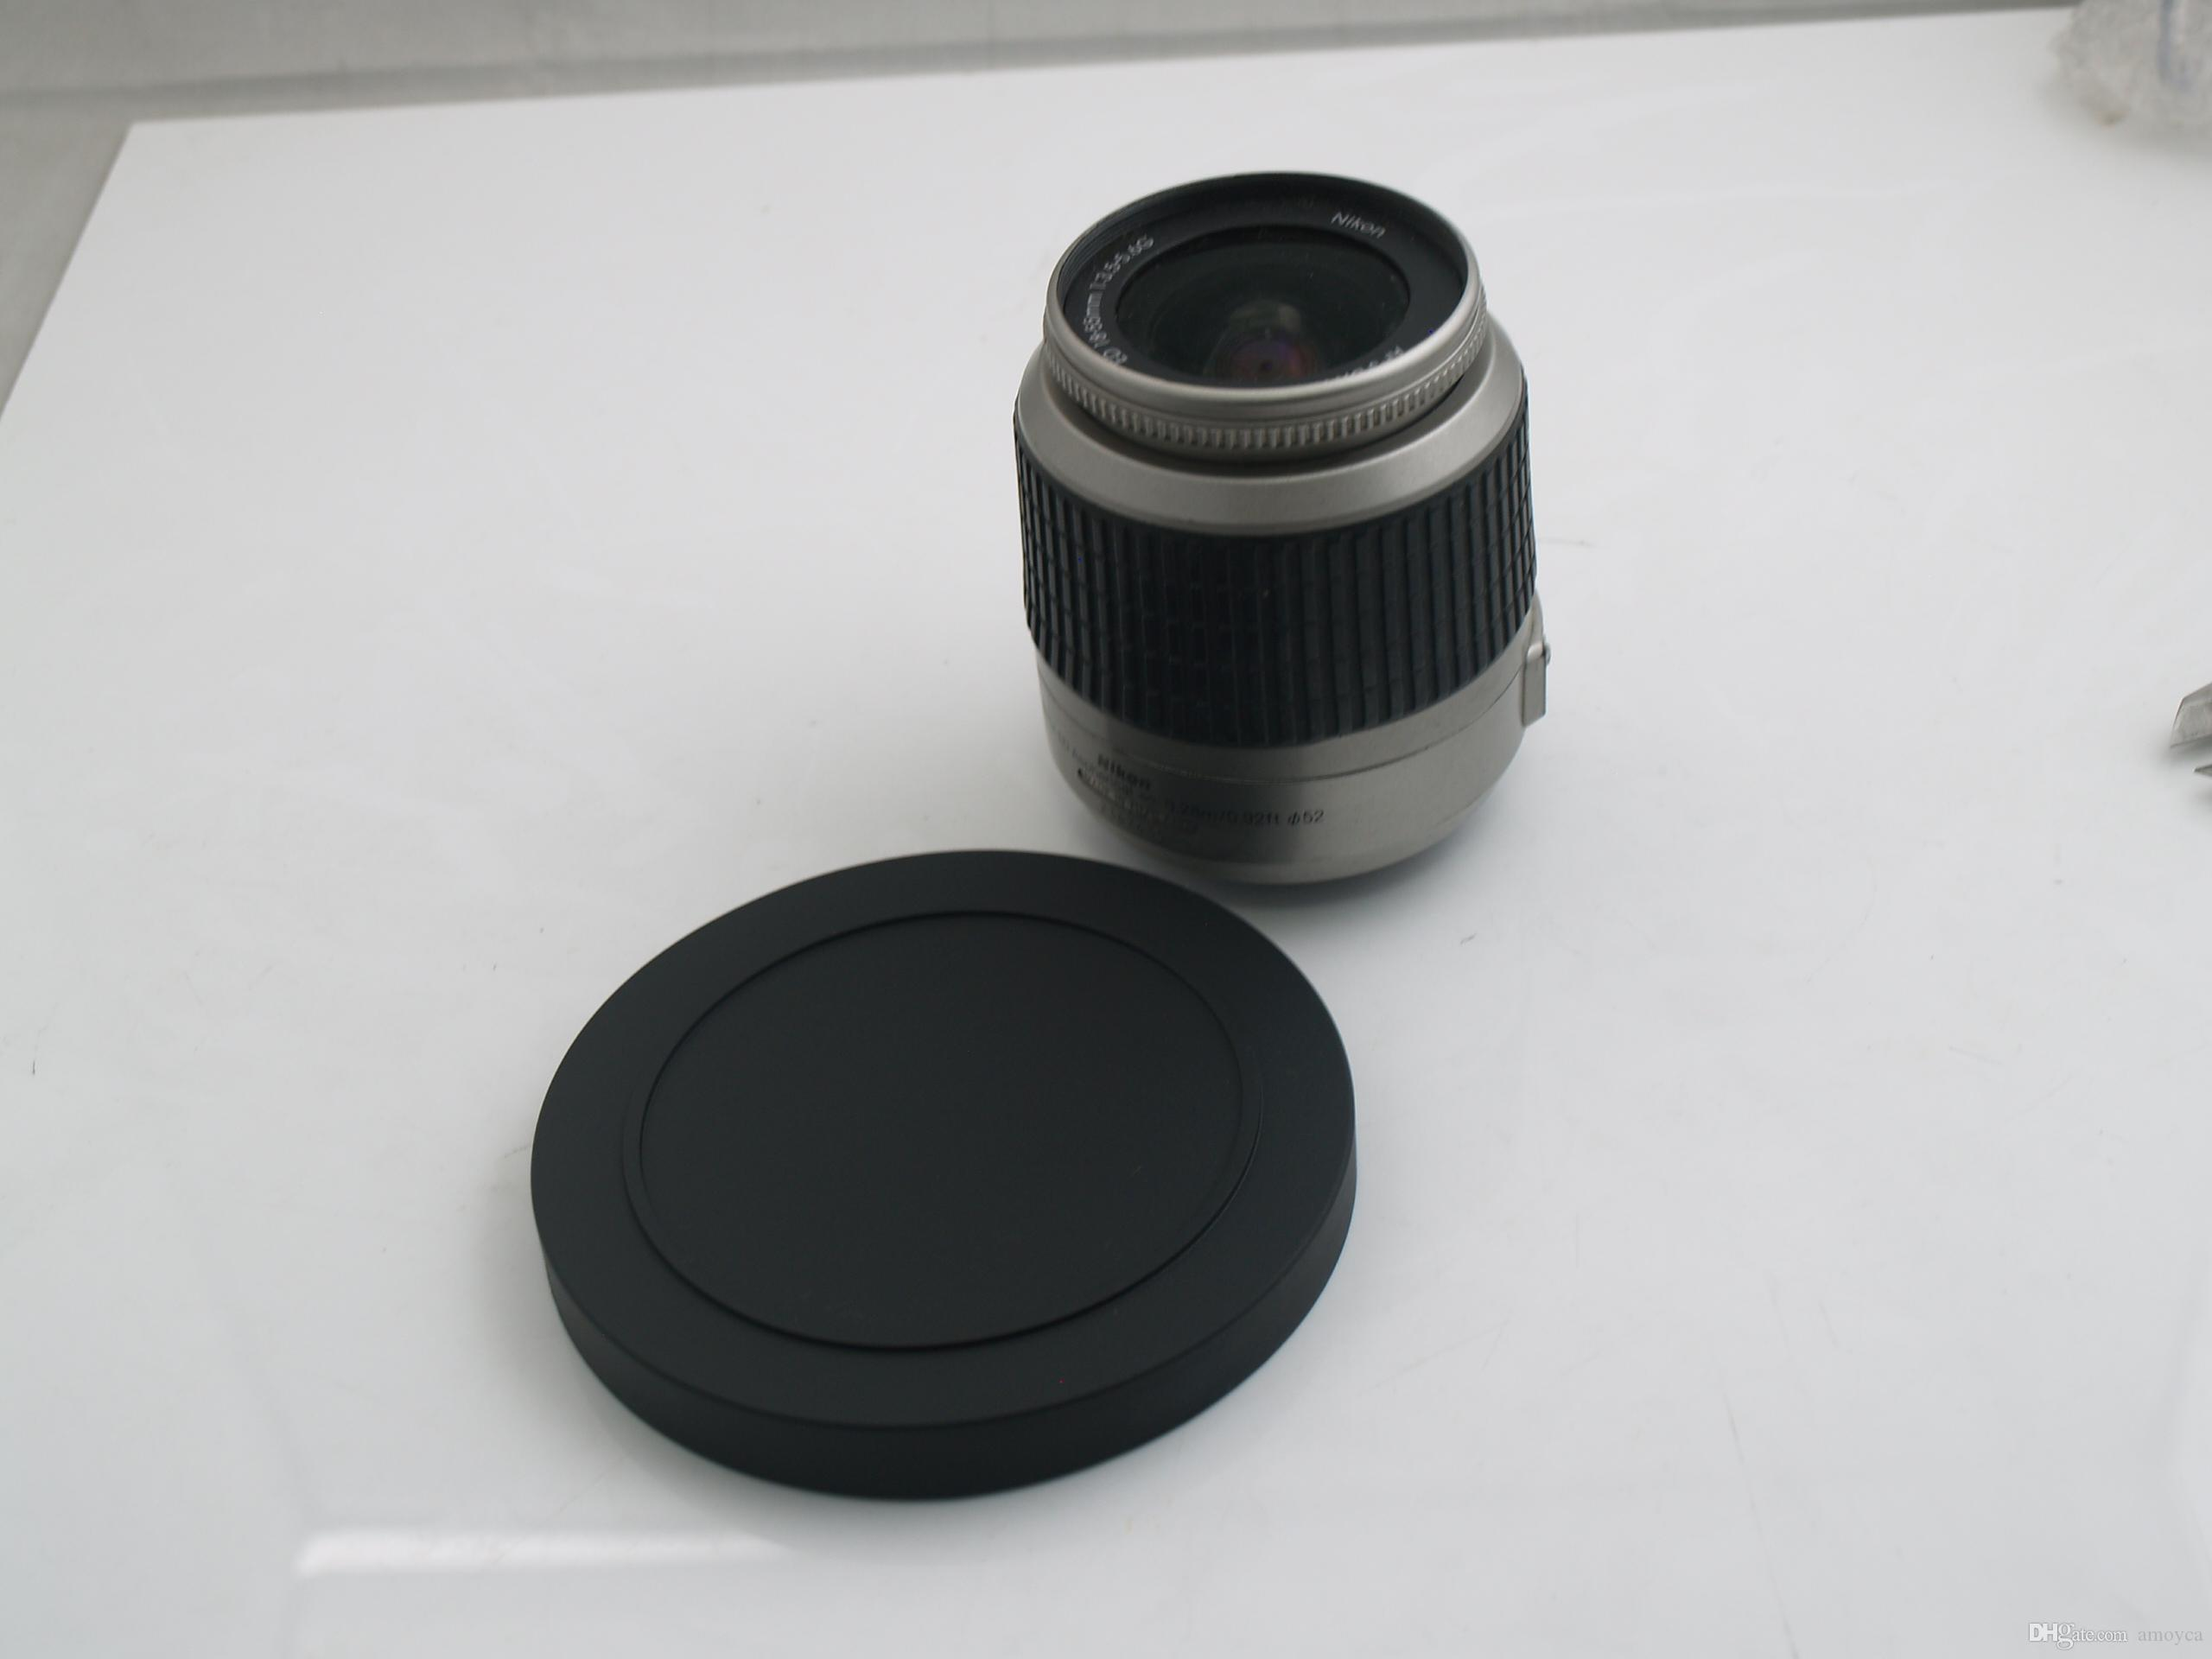 Sigma lenses camera concepts telescope solutions